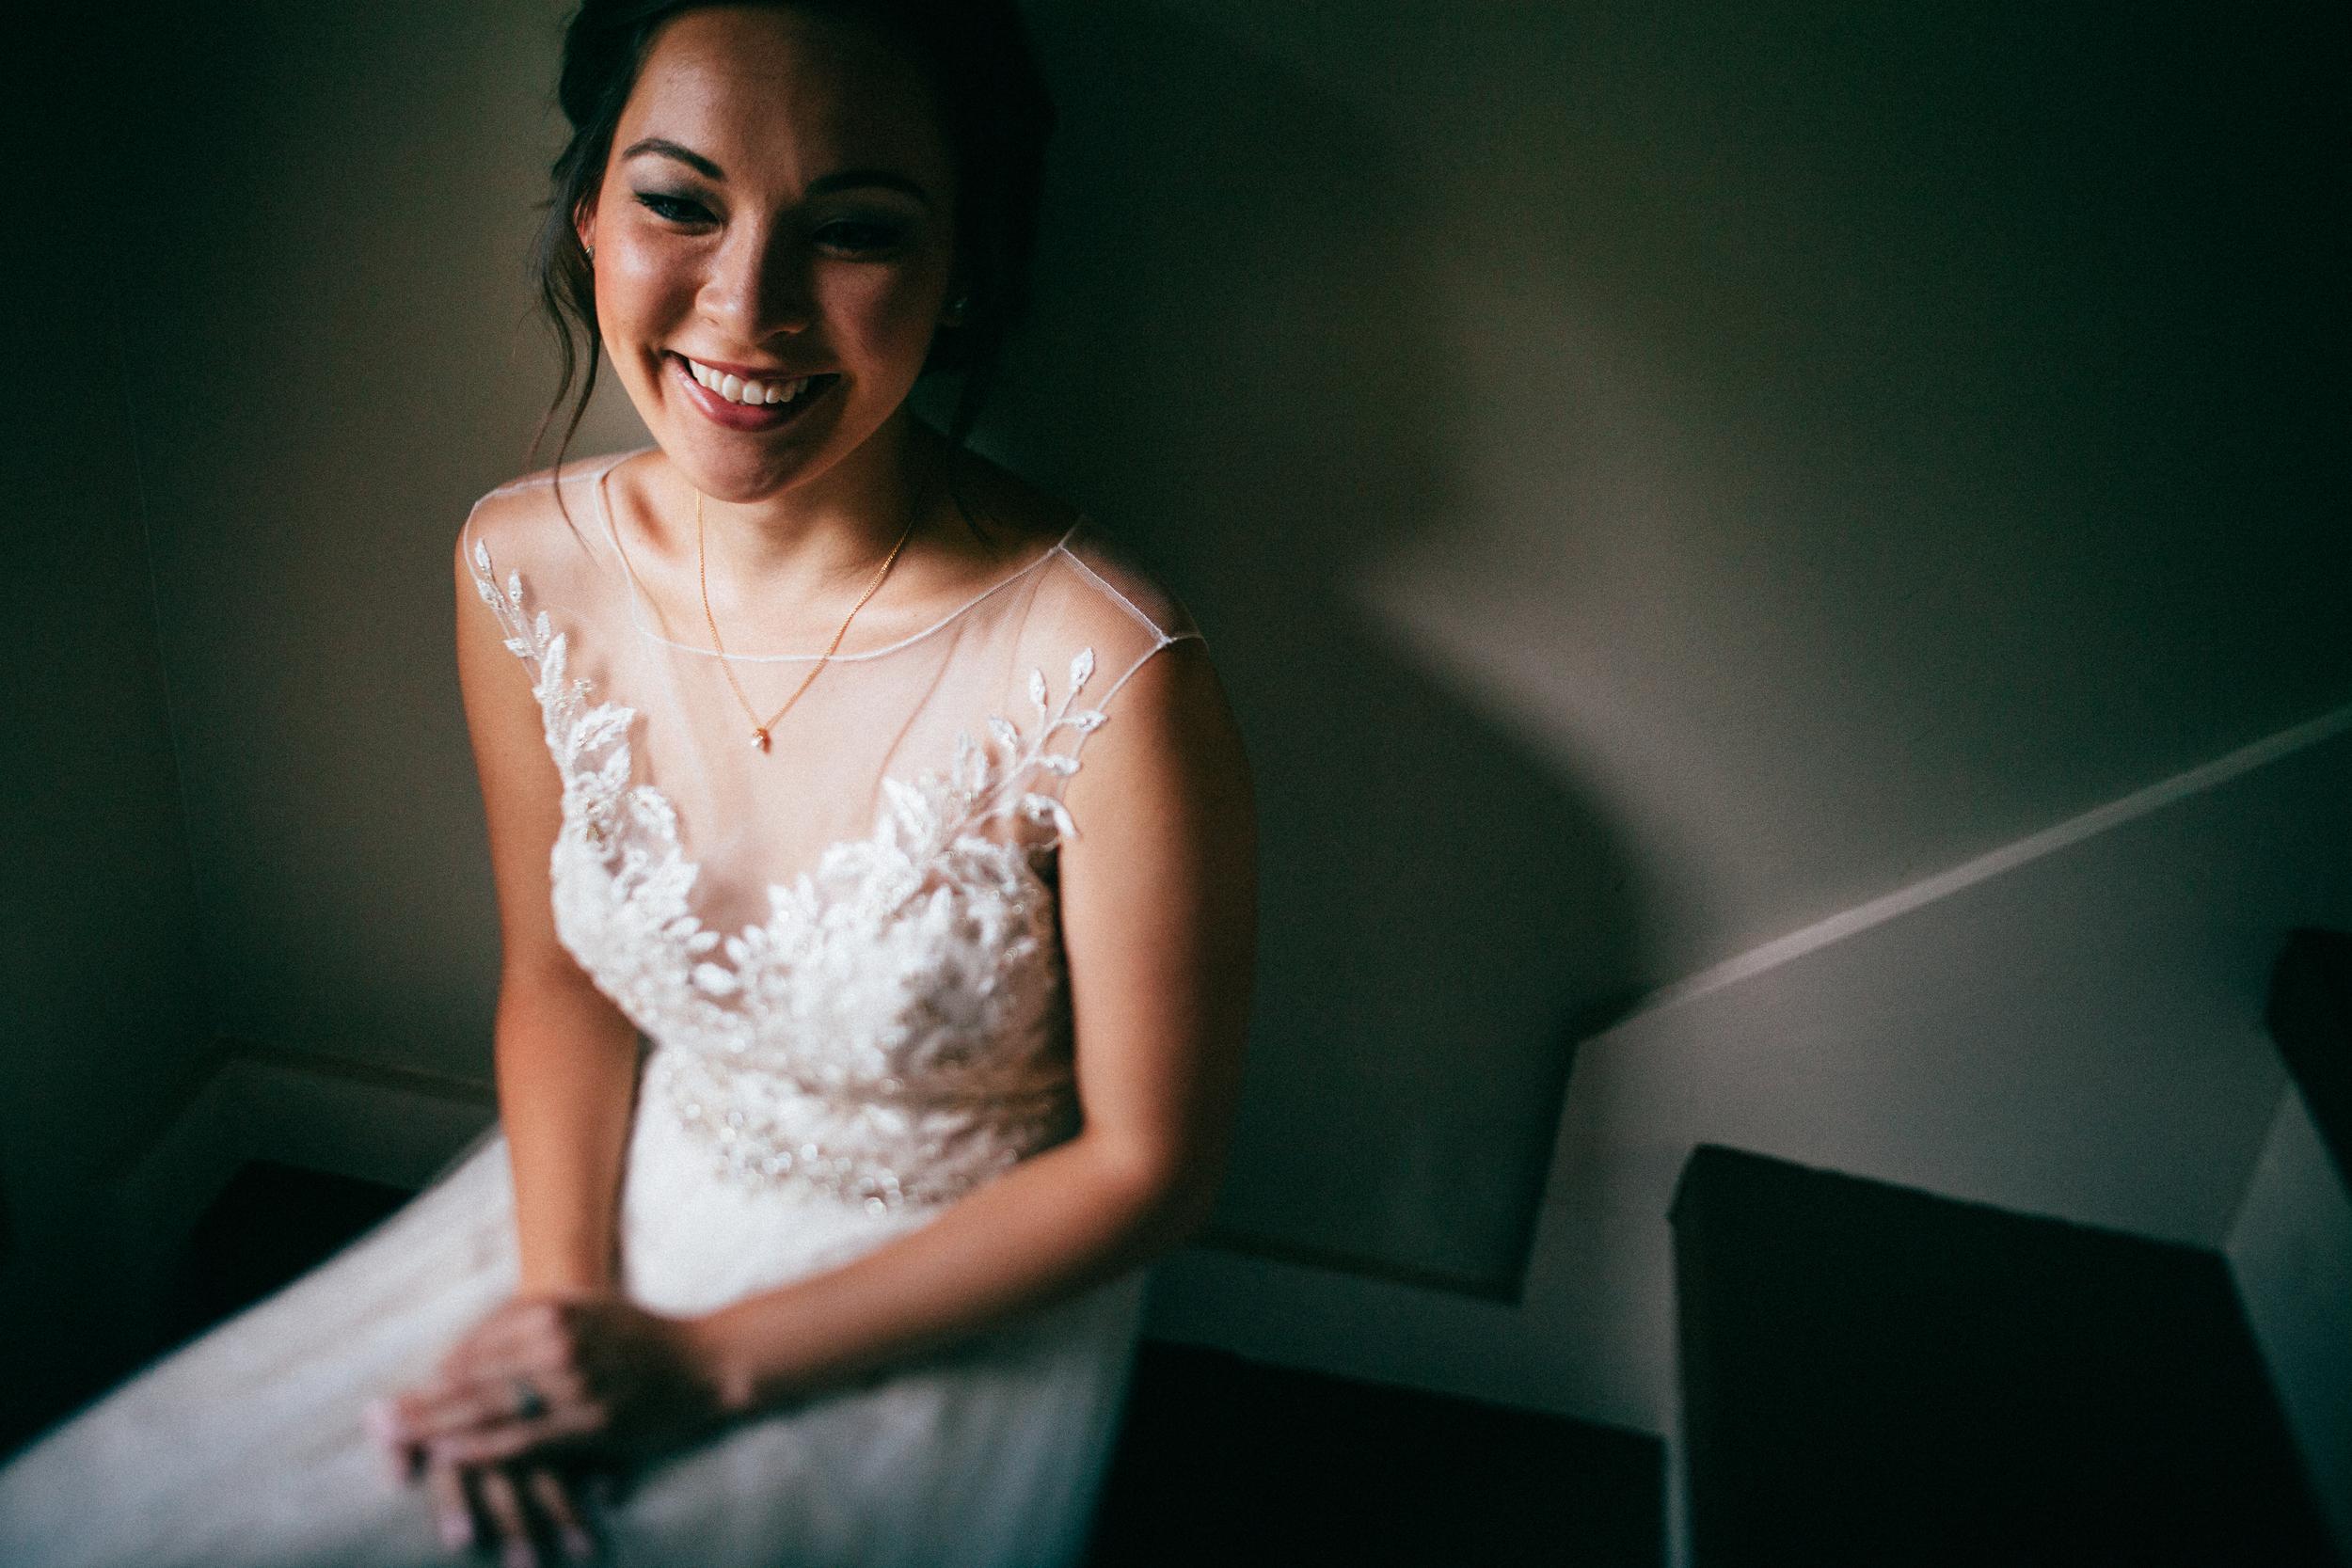 jacob-and-alyssa-wedding-4321.jpg